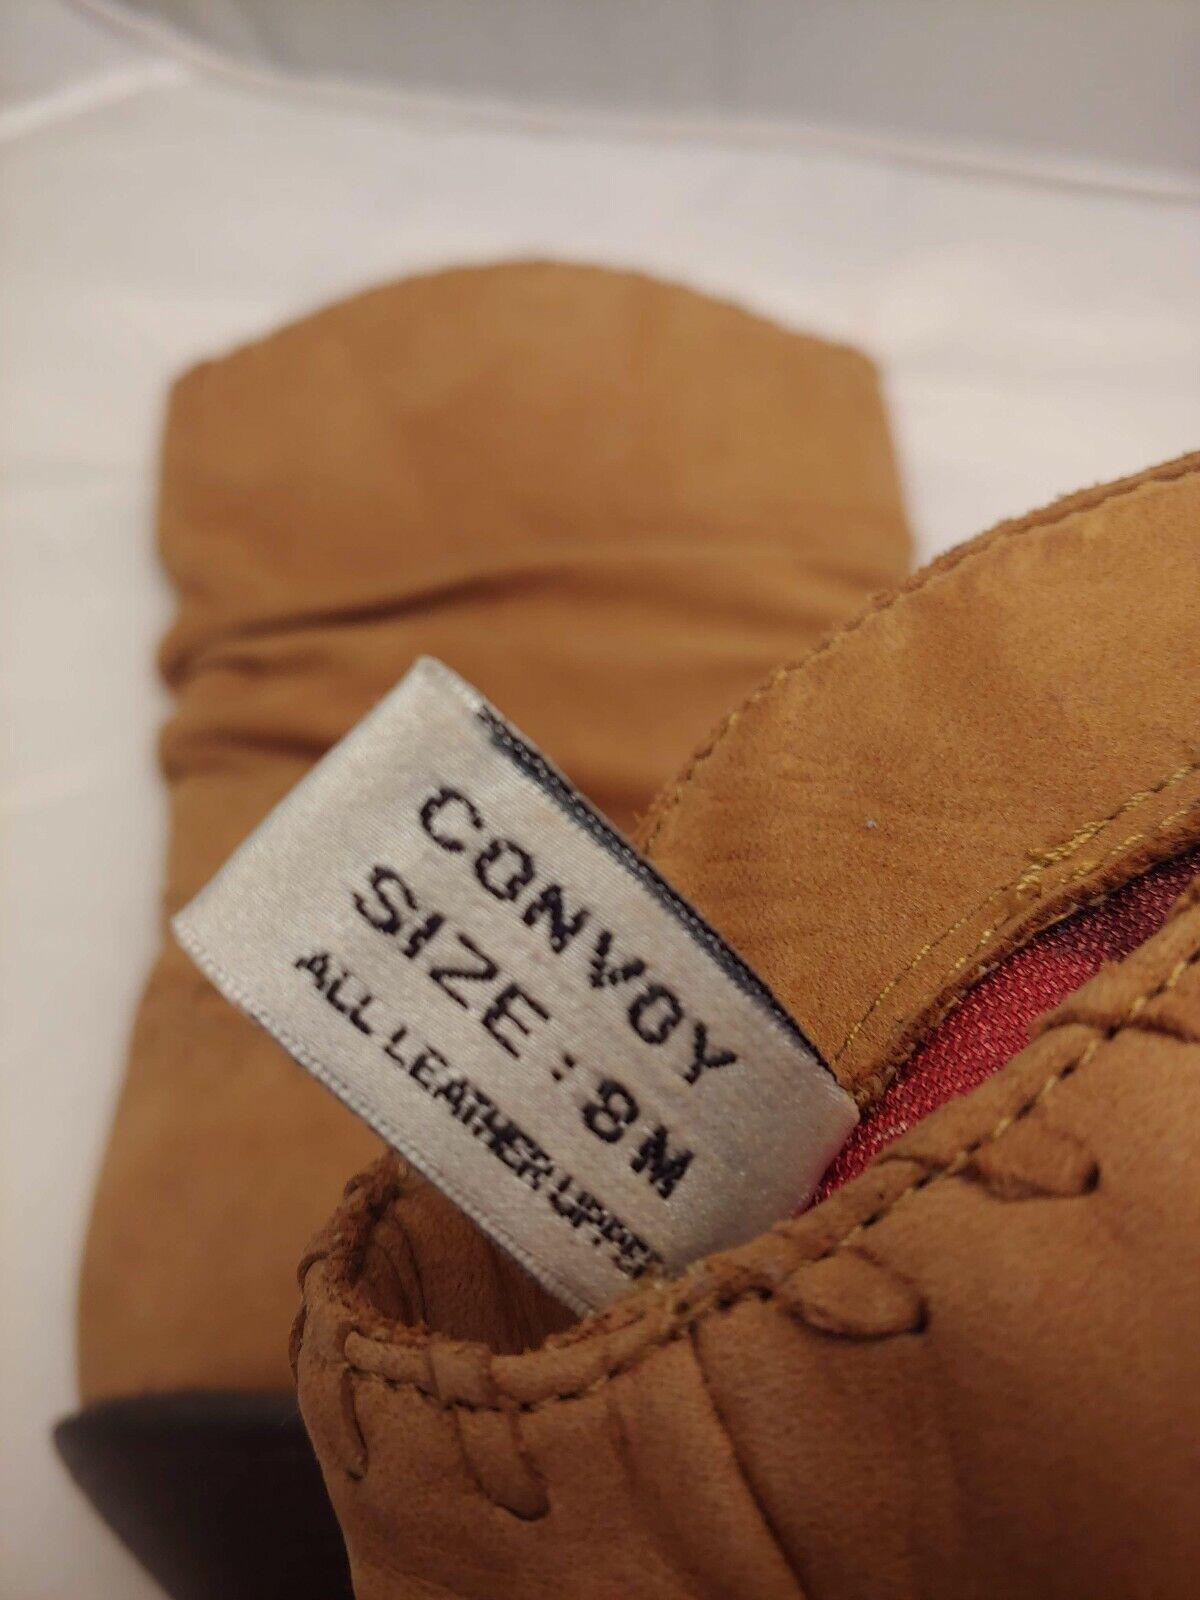 Zodiac Vintage stivali 8 8 8 M Leather Slouch Cowboy Western Tan Camel 1d99ea